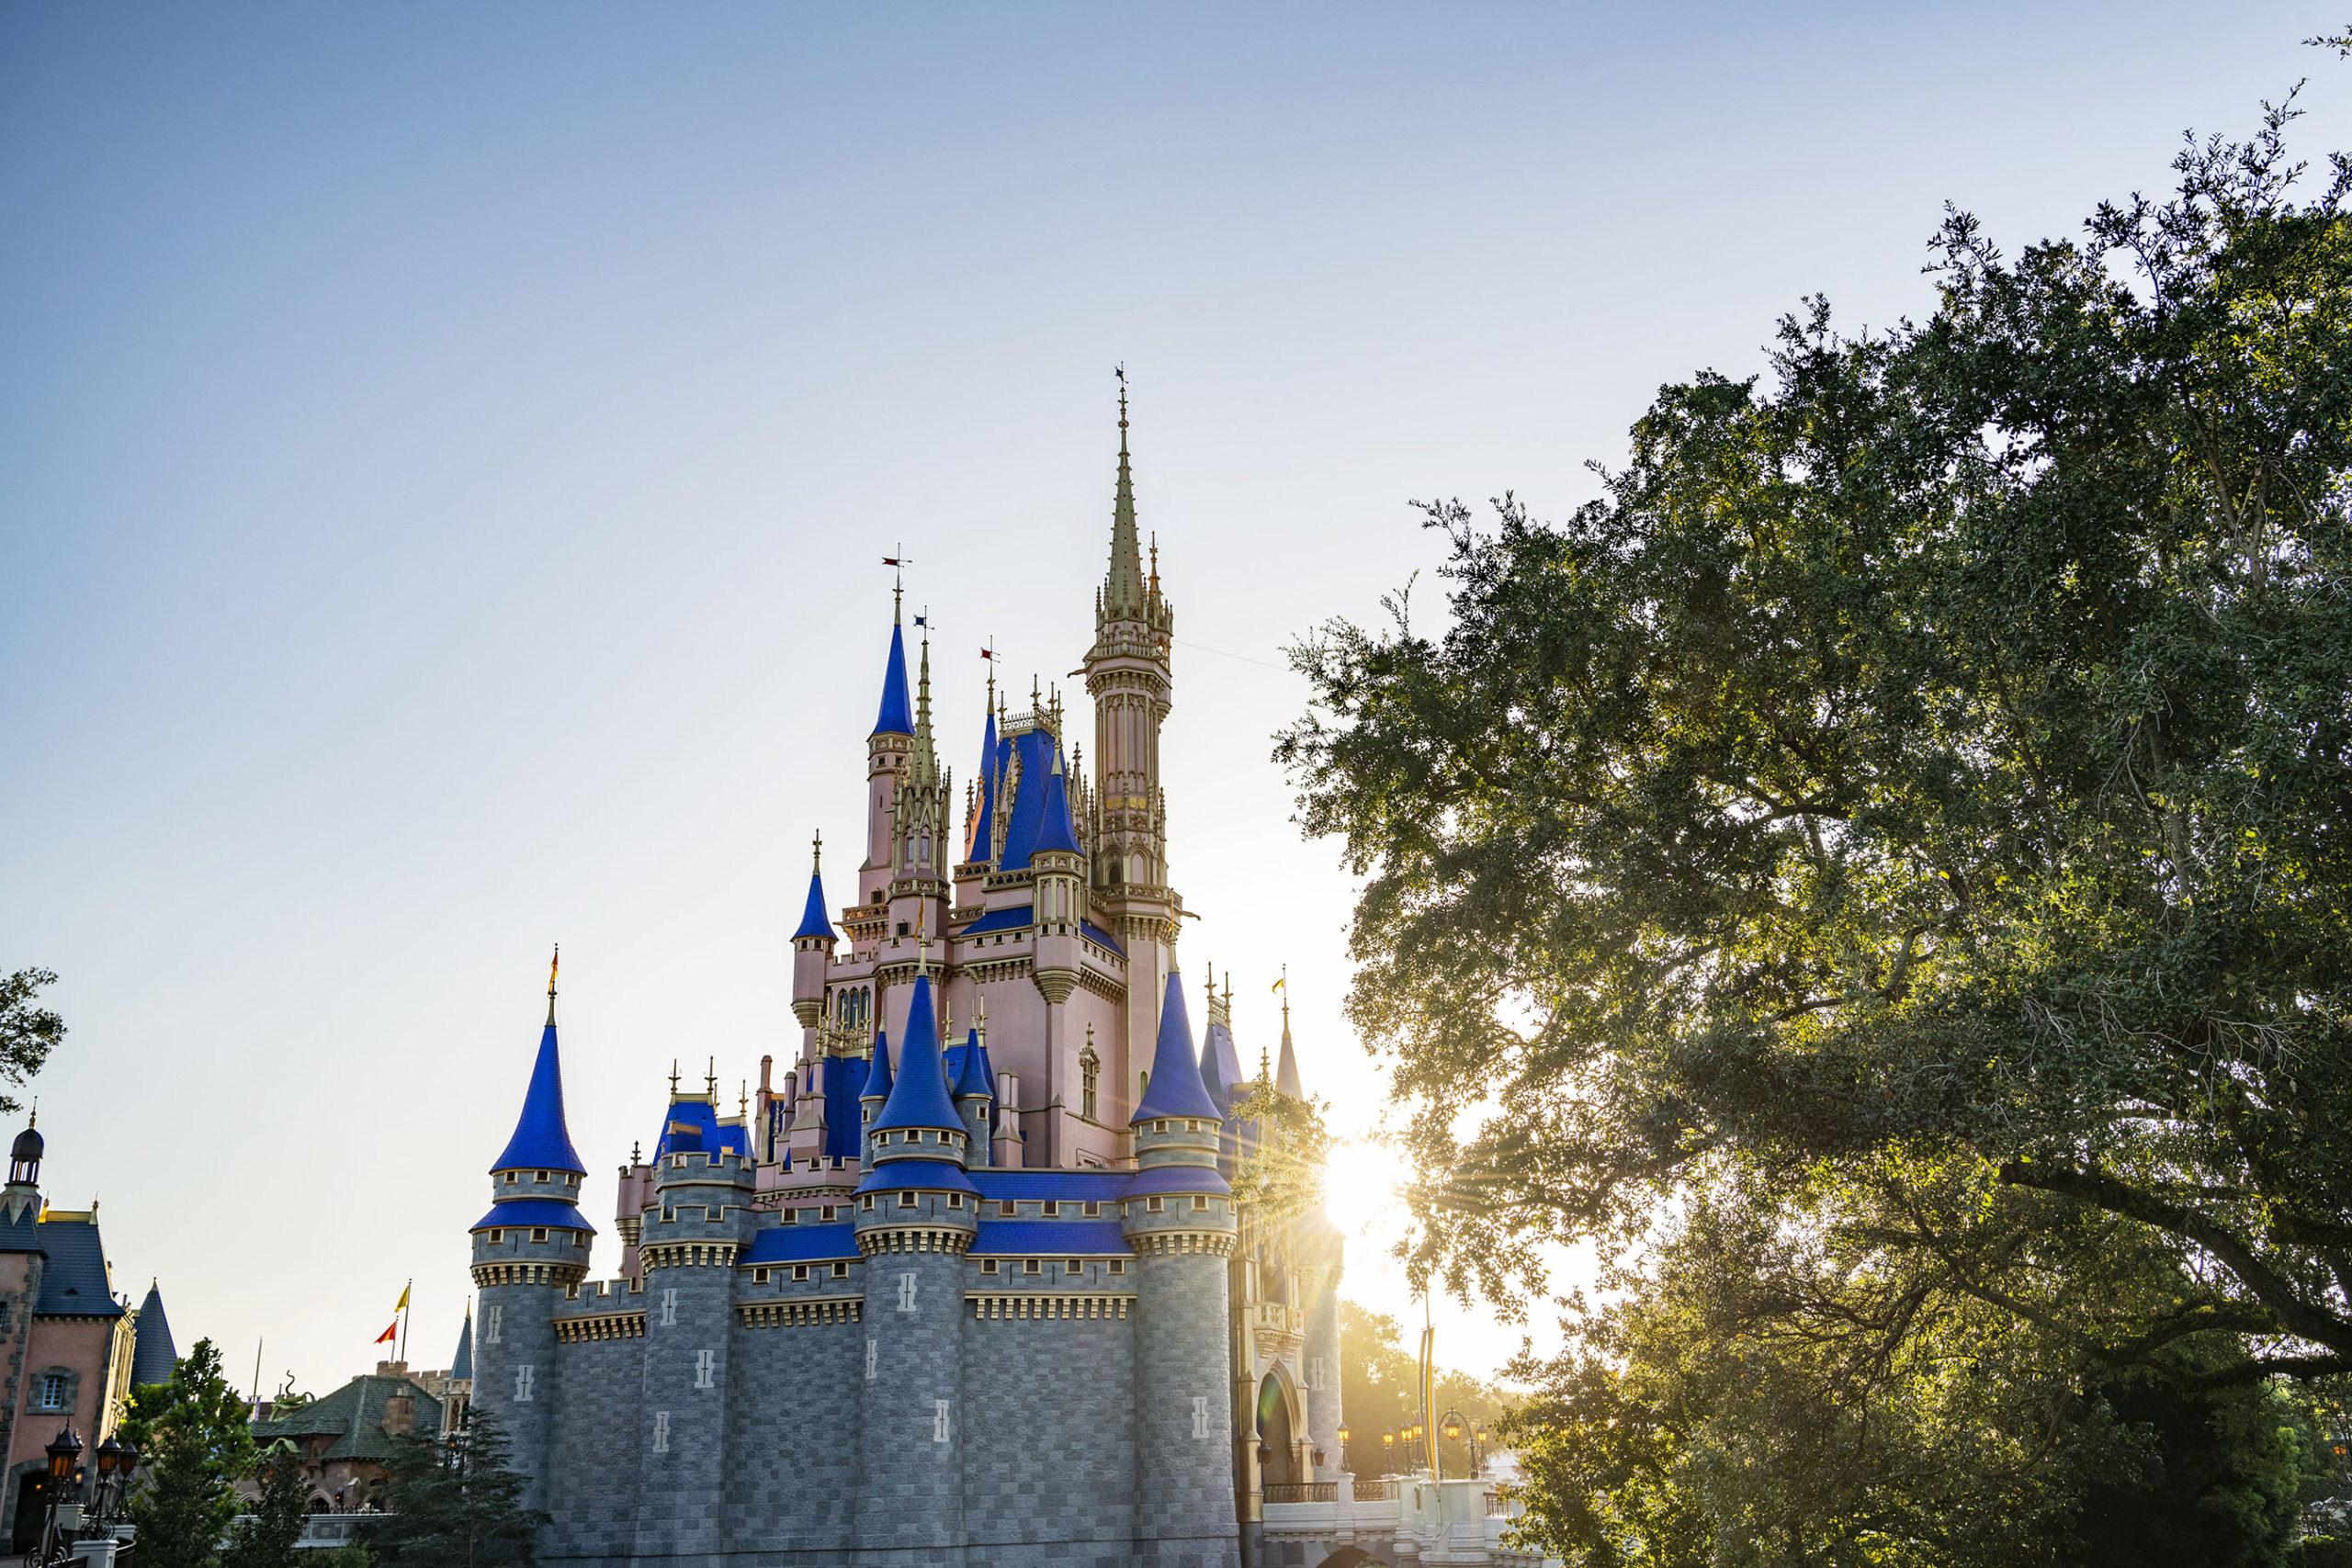 Walt Disney World Resort in Lake Buena Vista, Fla., is The Most Magical Place on Earth to kick off 2021. (Matt Stroshane, photographer)